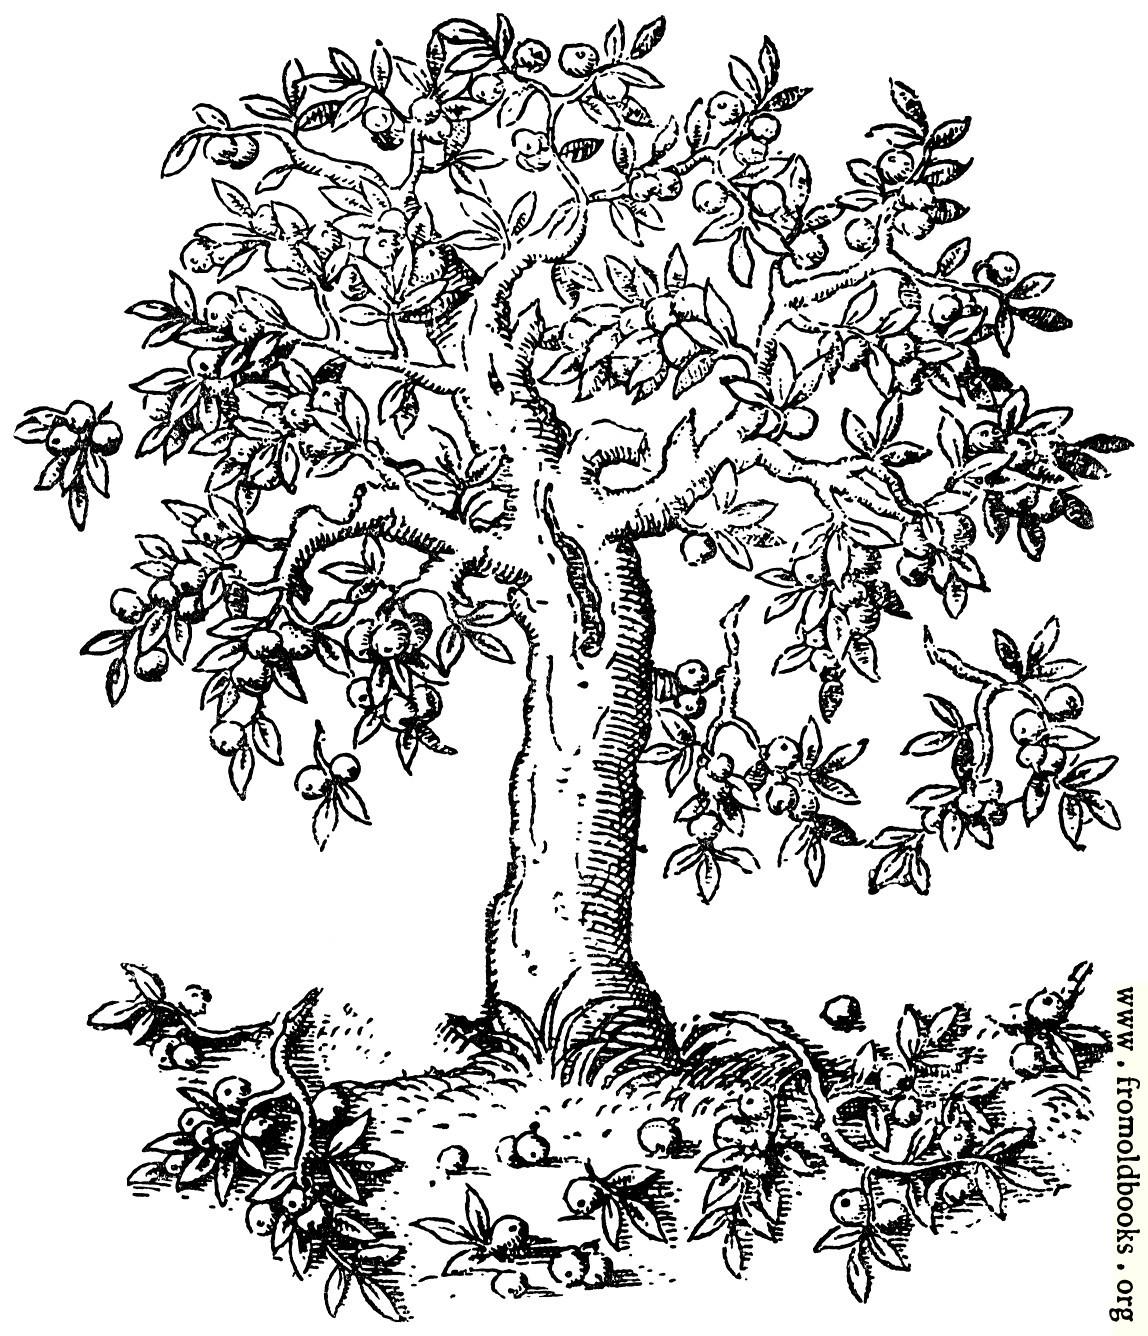 Uncategorized How To Draw A Apple Tree 322 tree pyrus malus c s 1148x1336 470k jpg free download